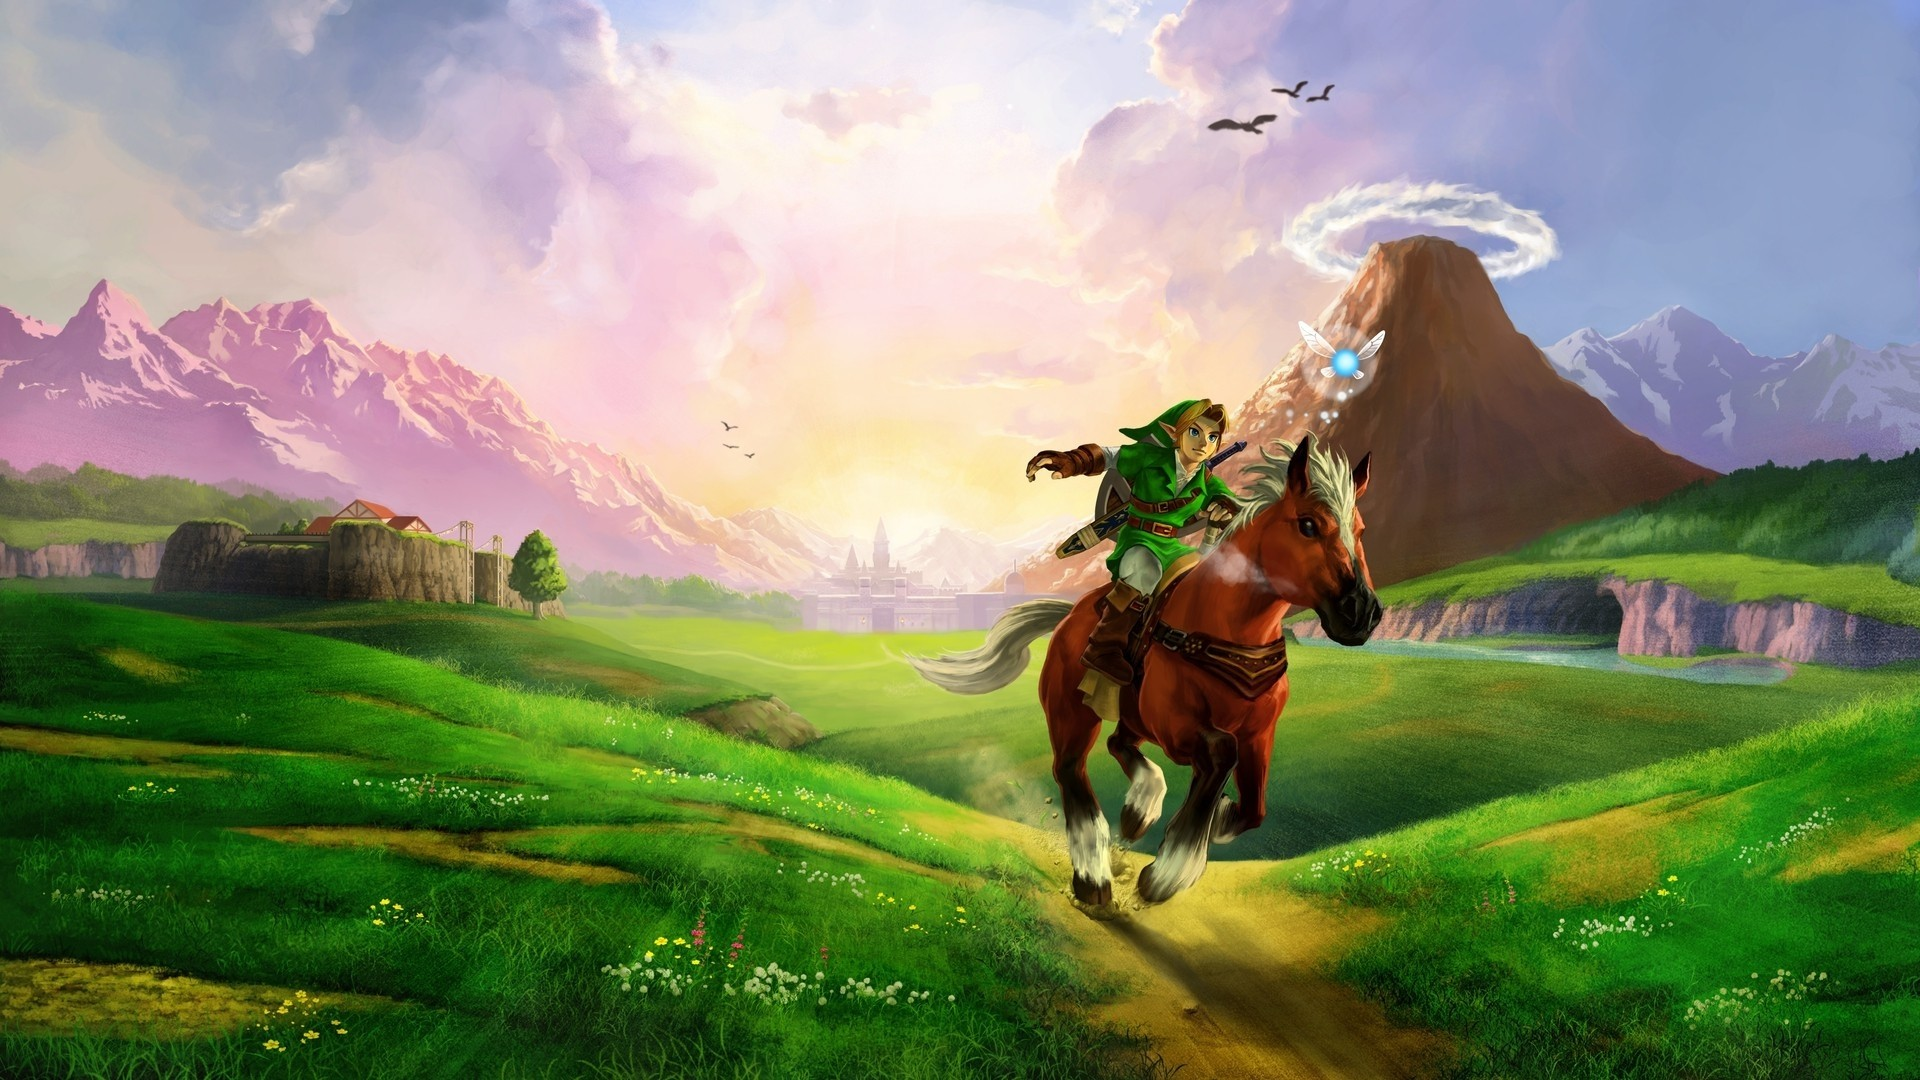 Preview wallpaper the legend of zelda, horse, plain, river, sunlight, zelda